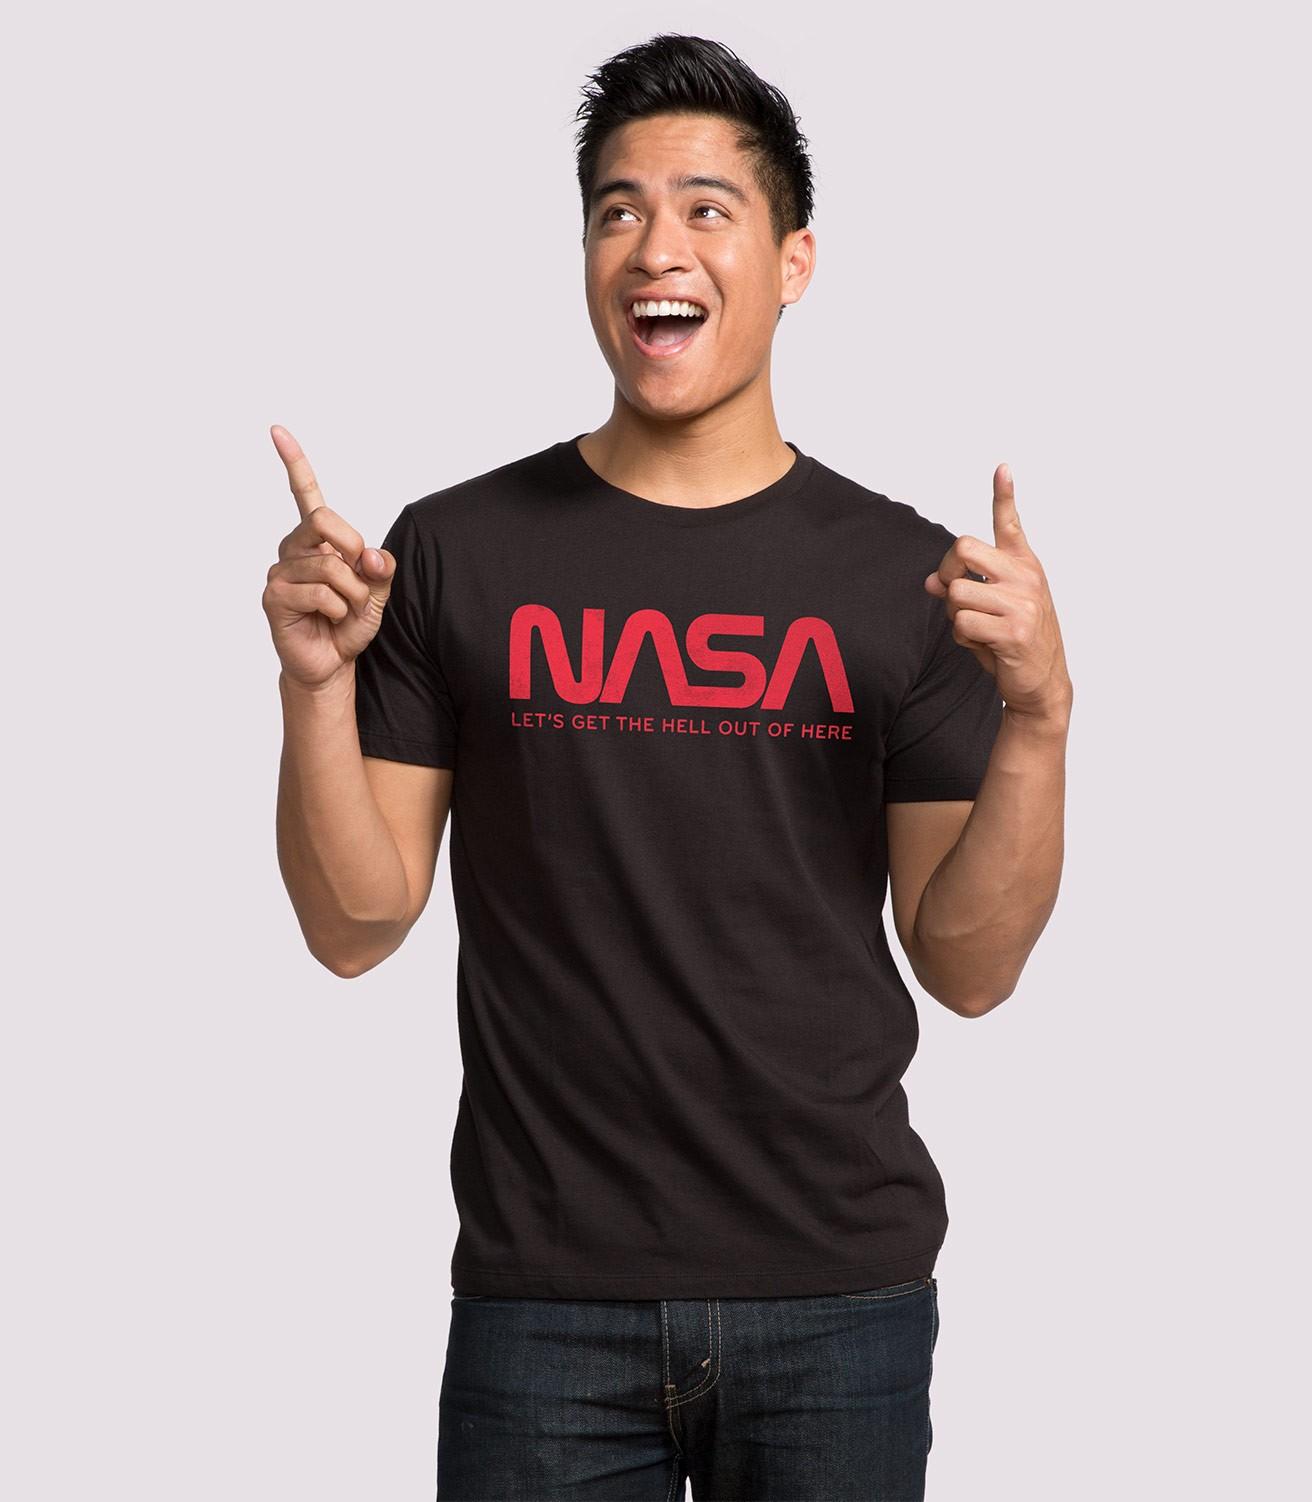 NASA Men's Funny T-Shirt | Headline Shirts